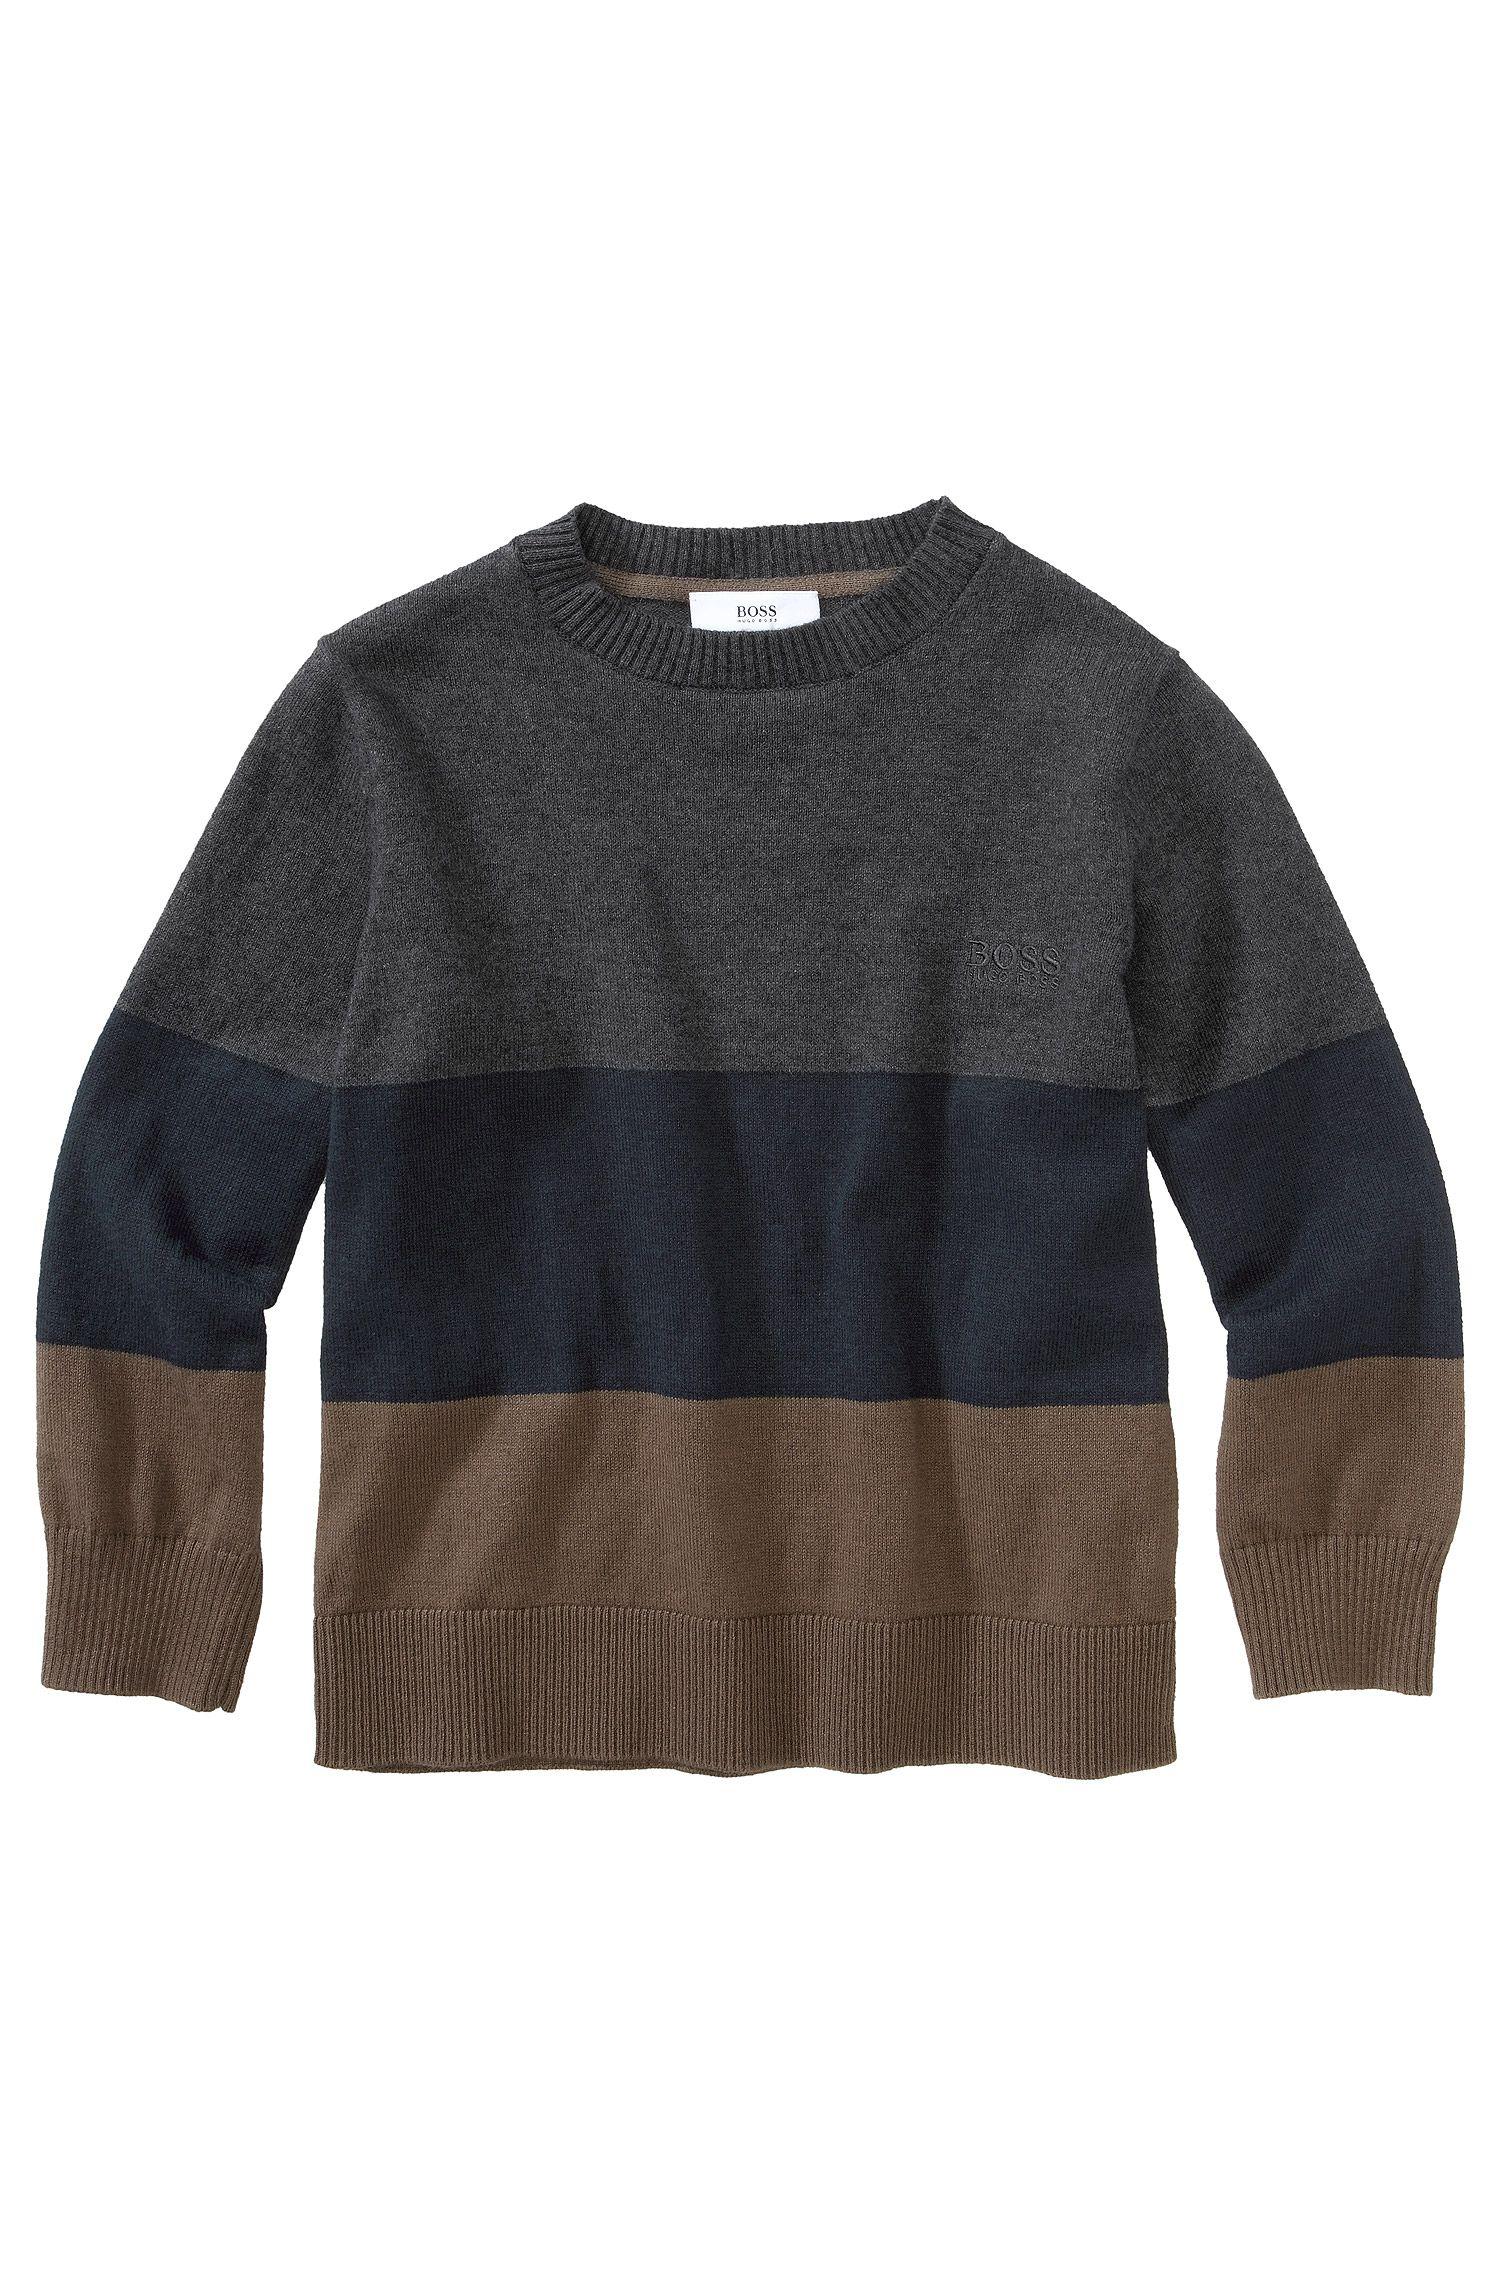 Kids Pullover ´J25597/A80` aus Baumwollkomposition